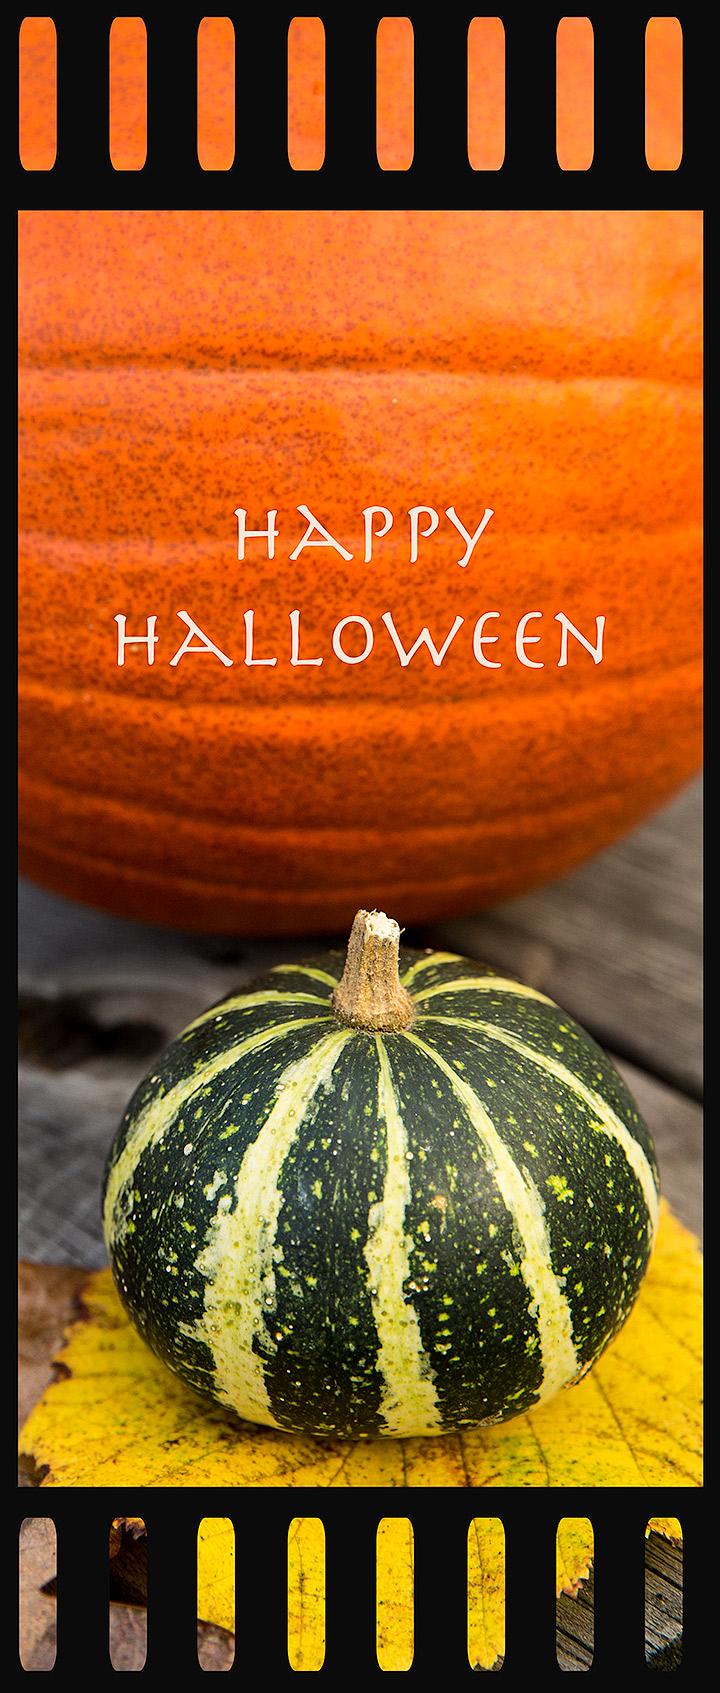 Tiina-Petersson-Halloween